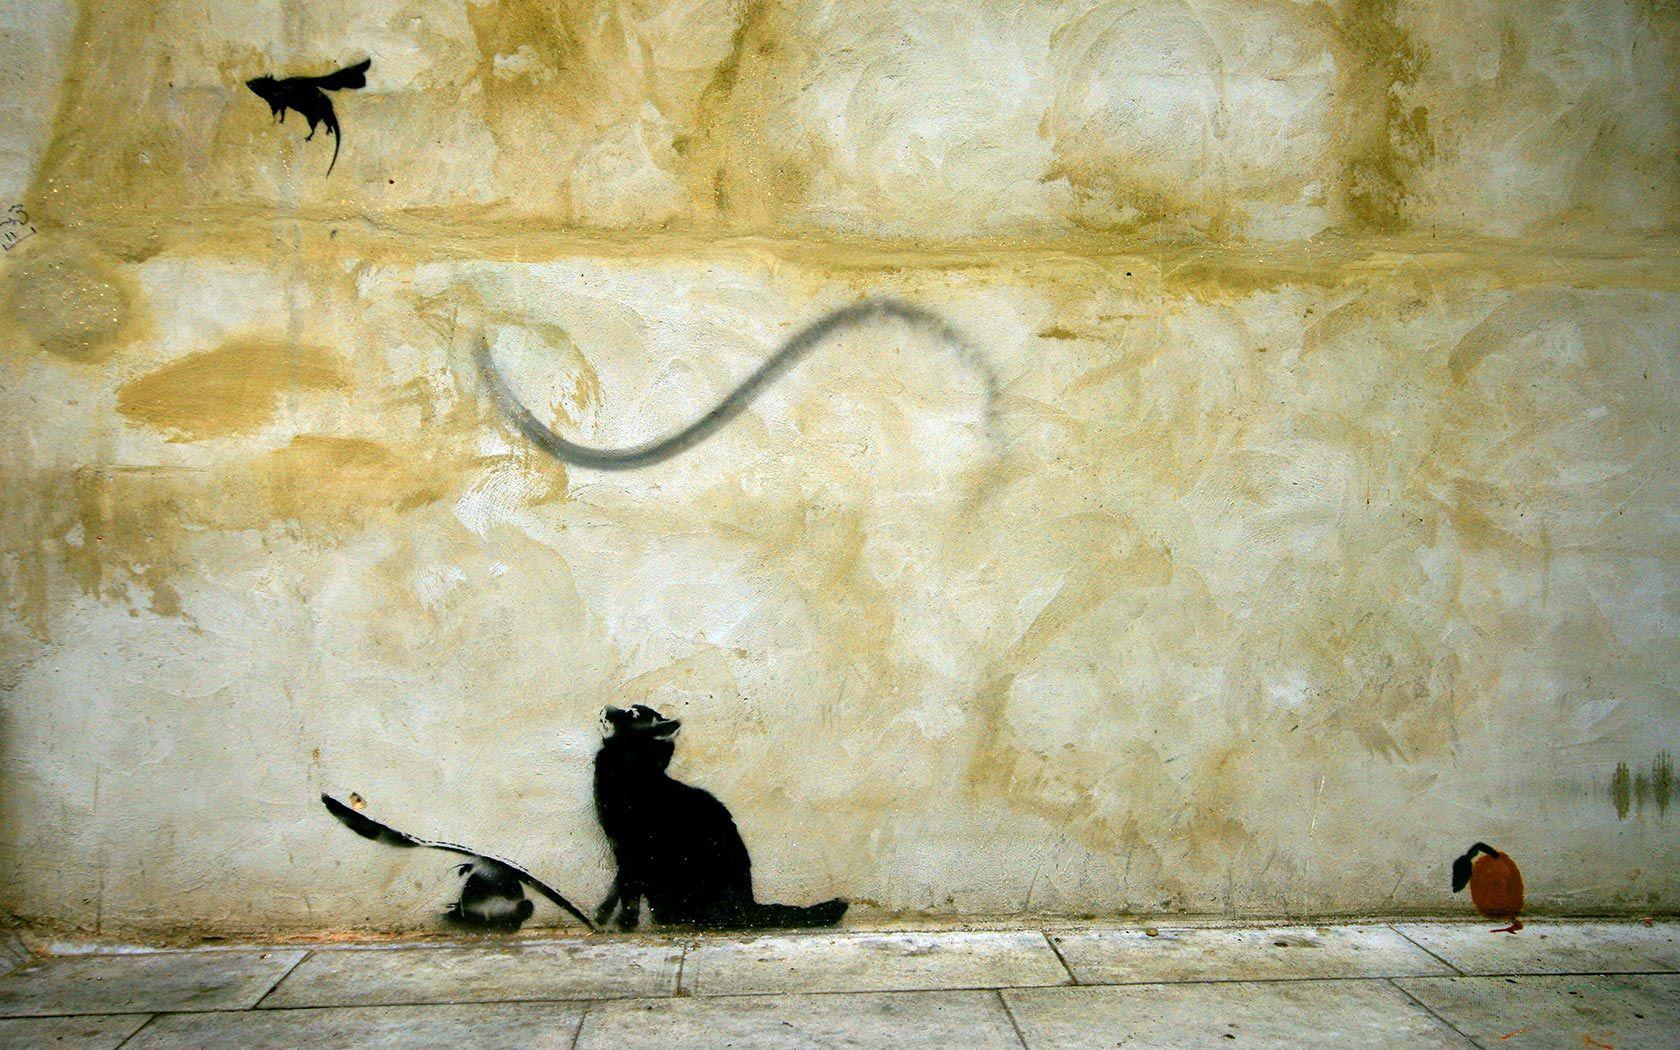 banksy birthday - Google Search | Banksy | Pinterest | Banksy ...